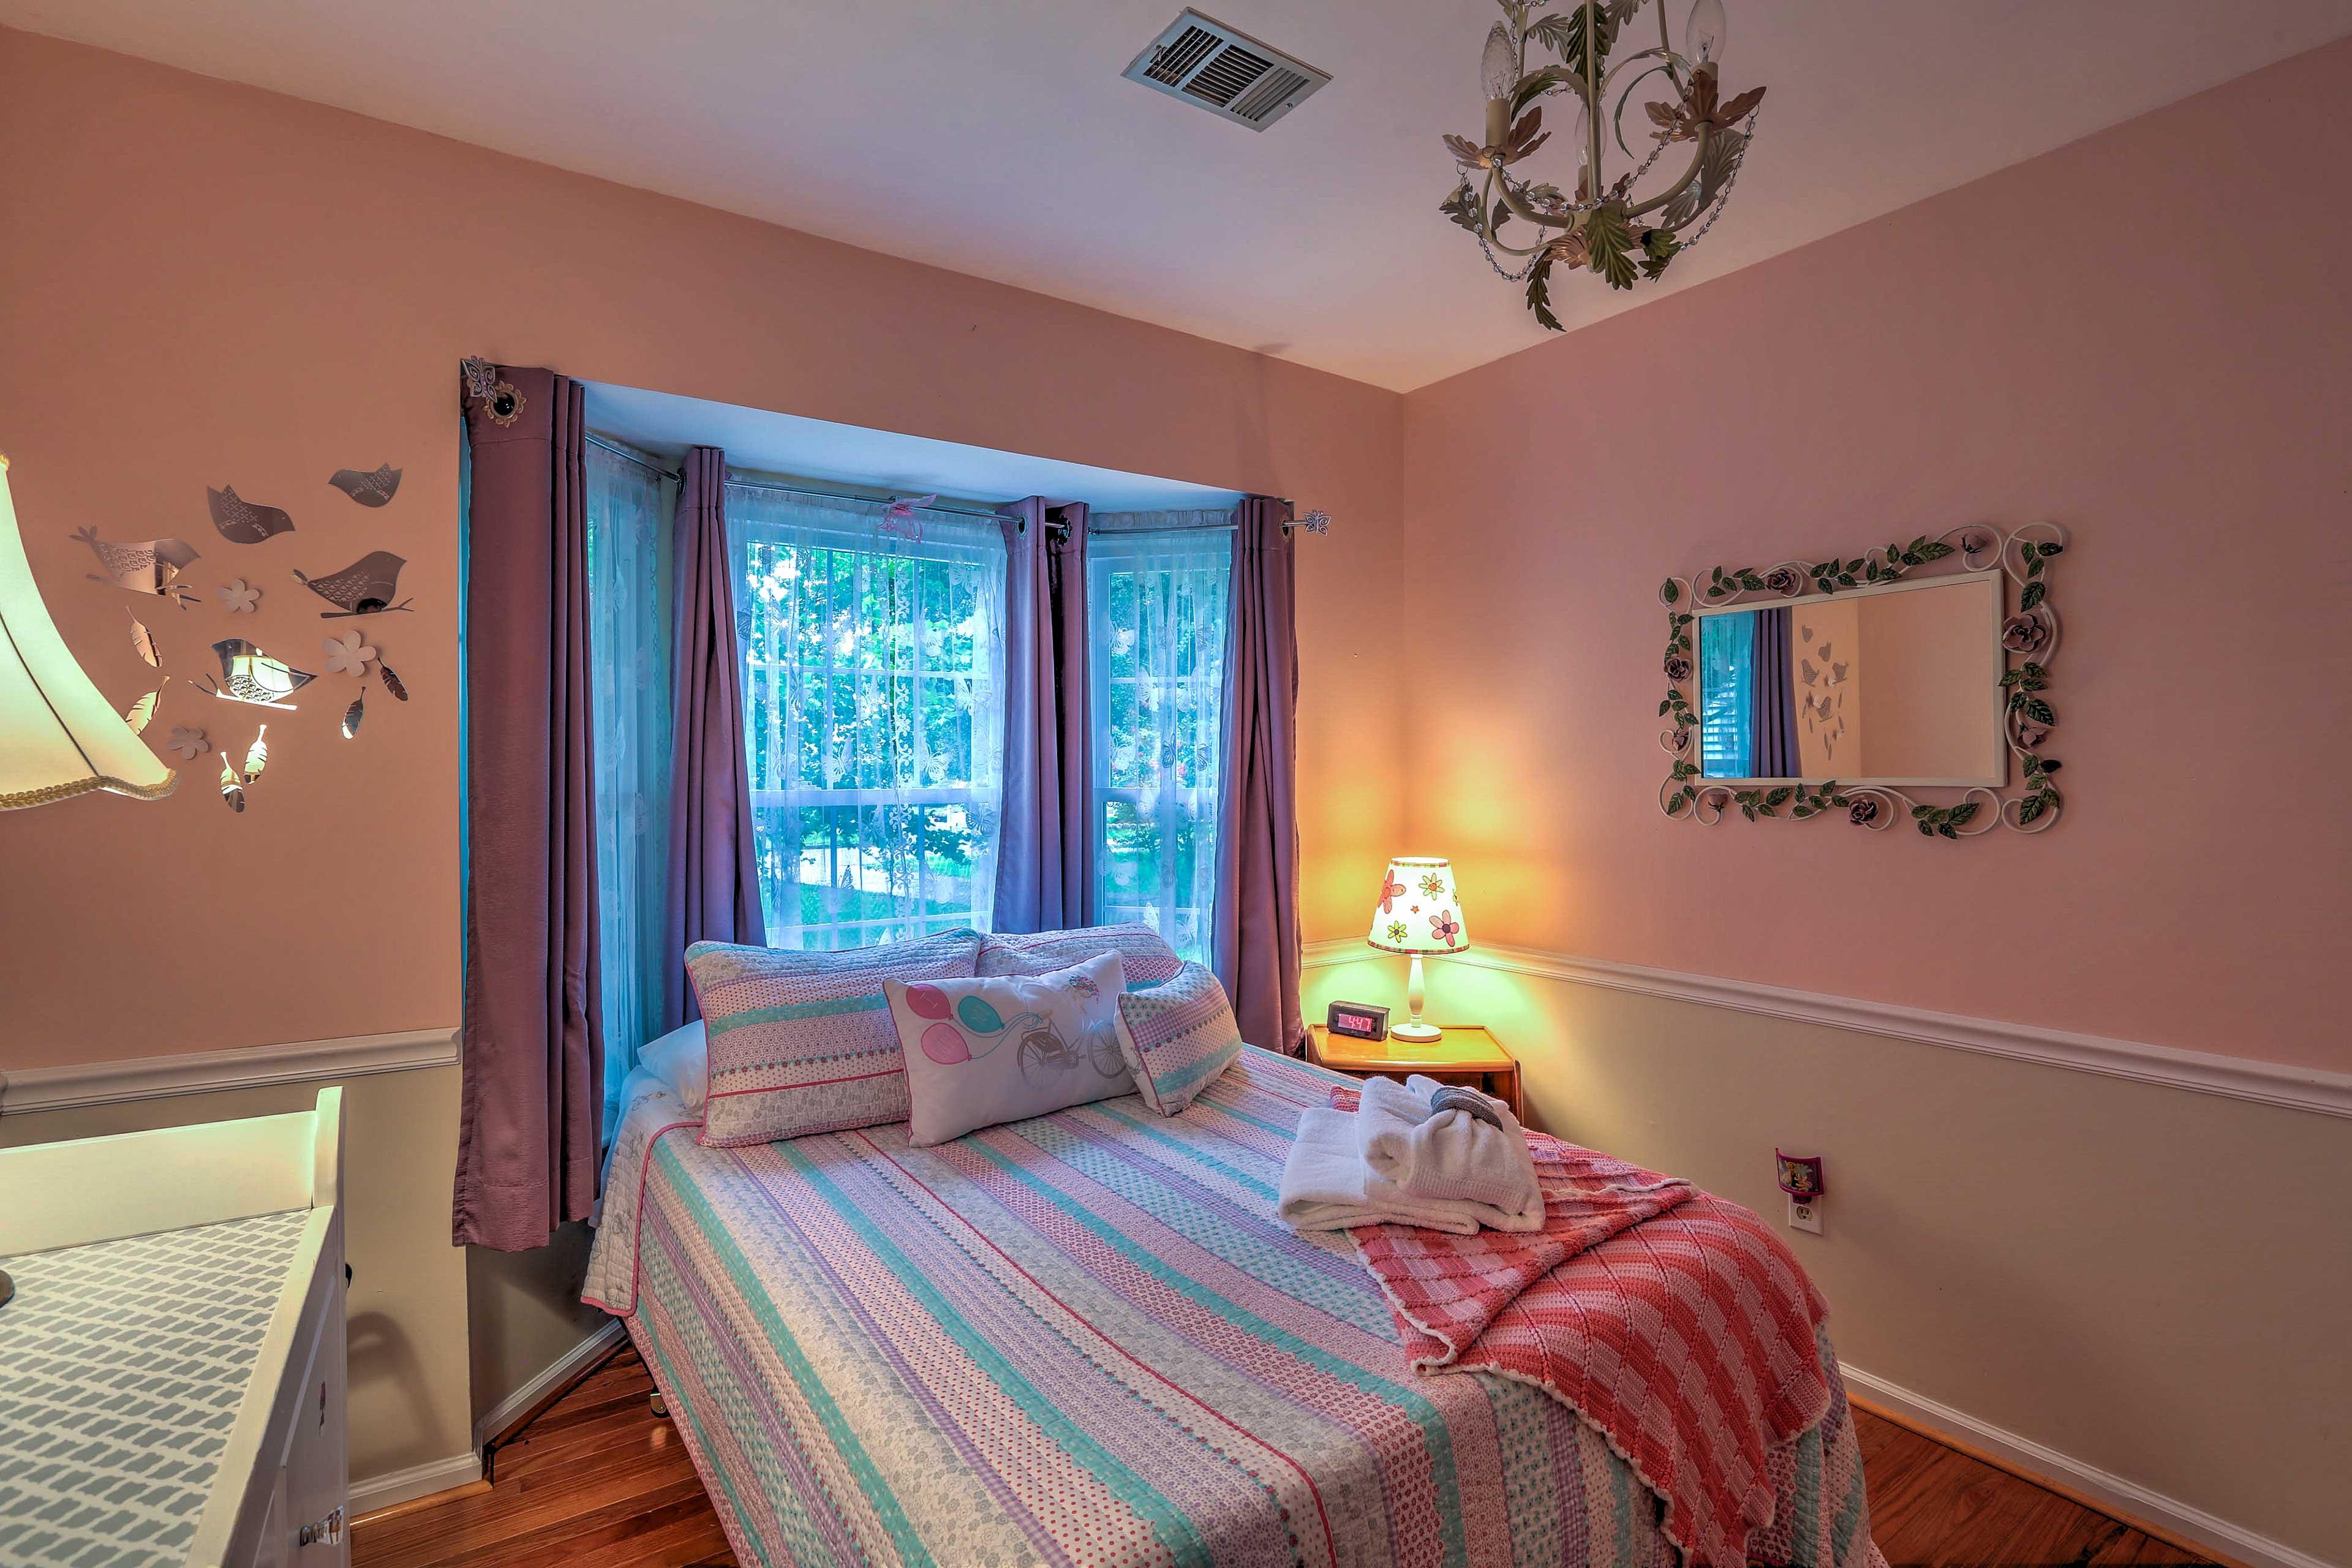 Each bedroom boasts tasteful decorations.